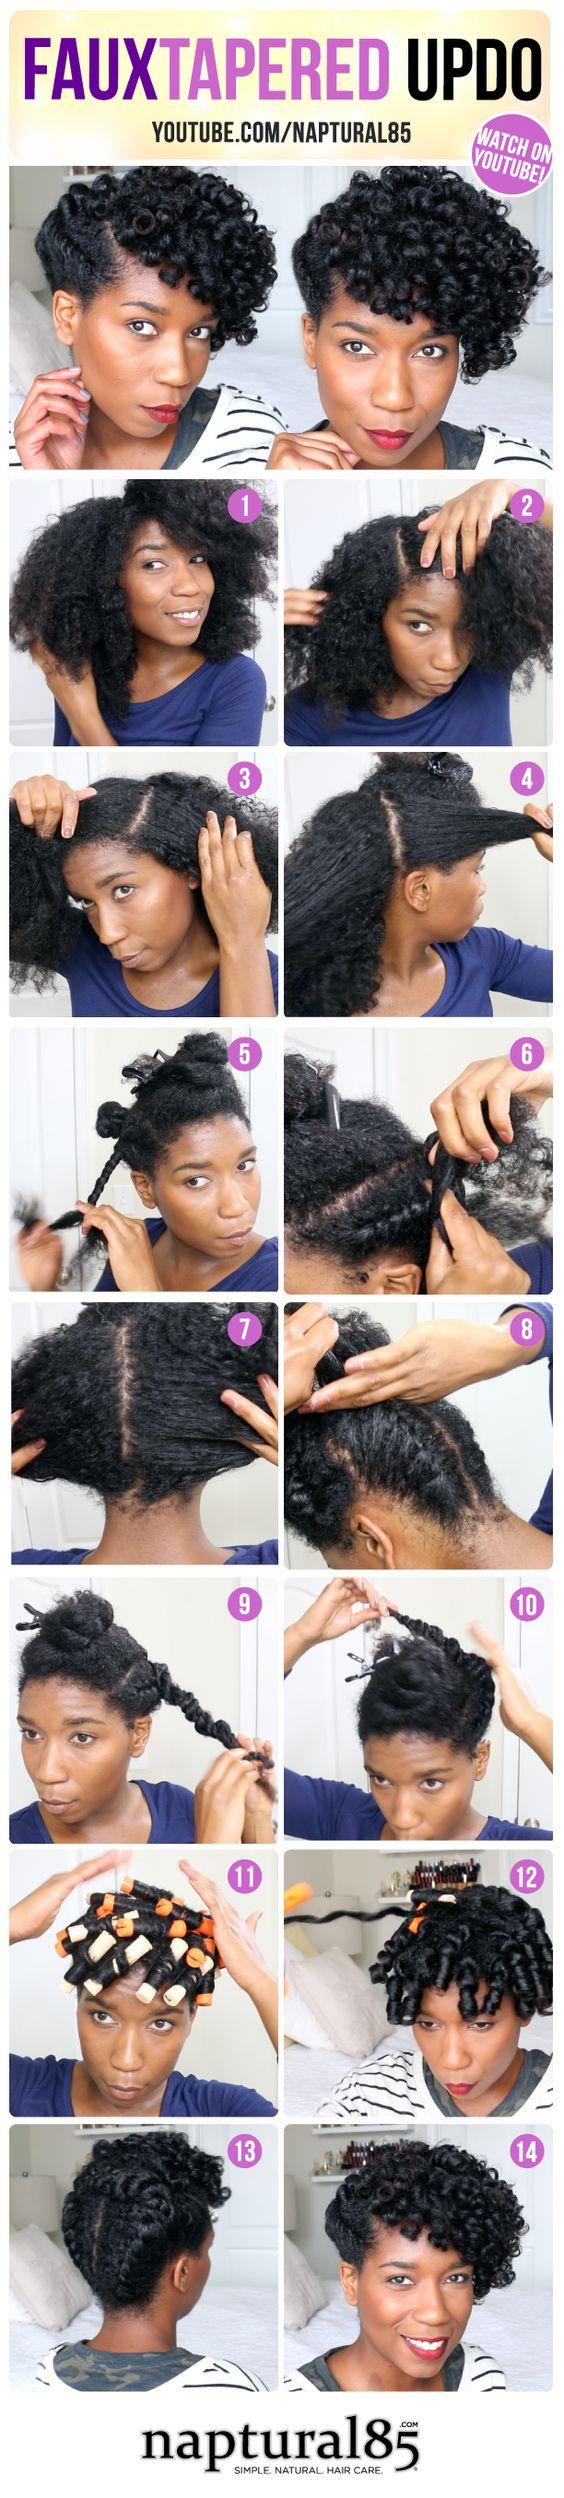 natural-hairstyles-9